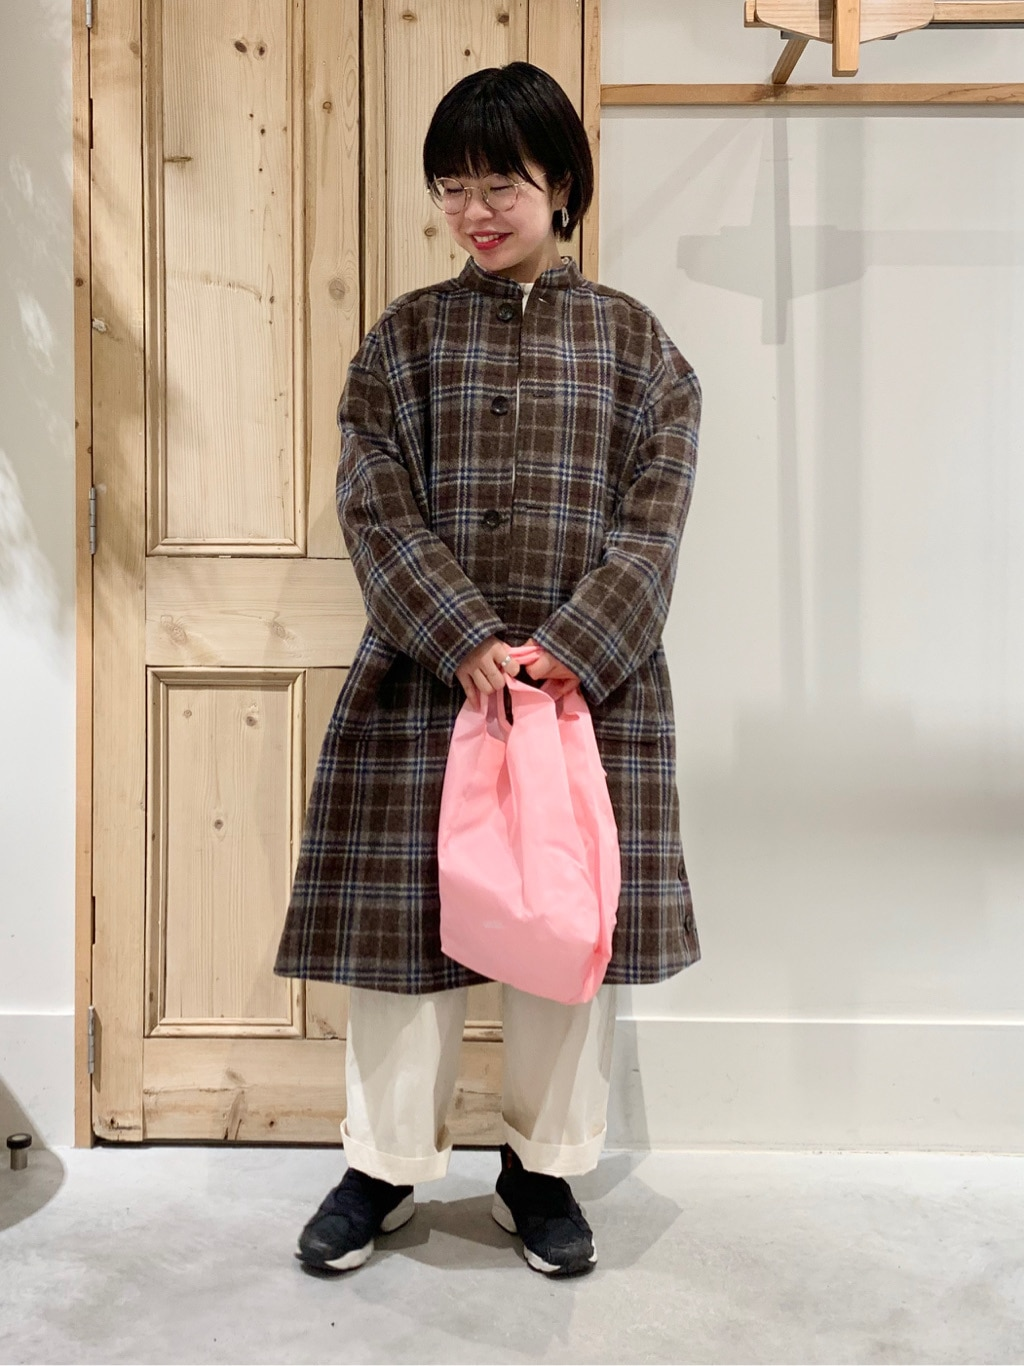 Malle chambre de charme 調布パルコ 身長:153cm 2020.10.26